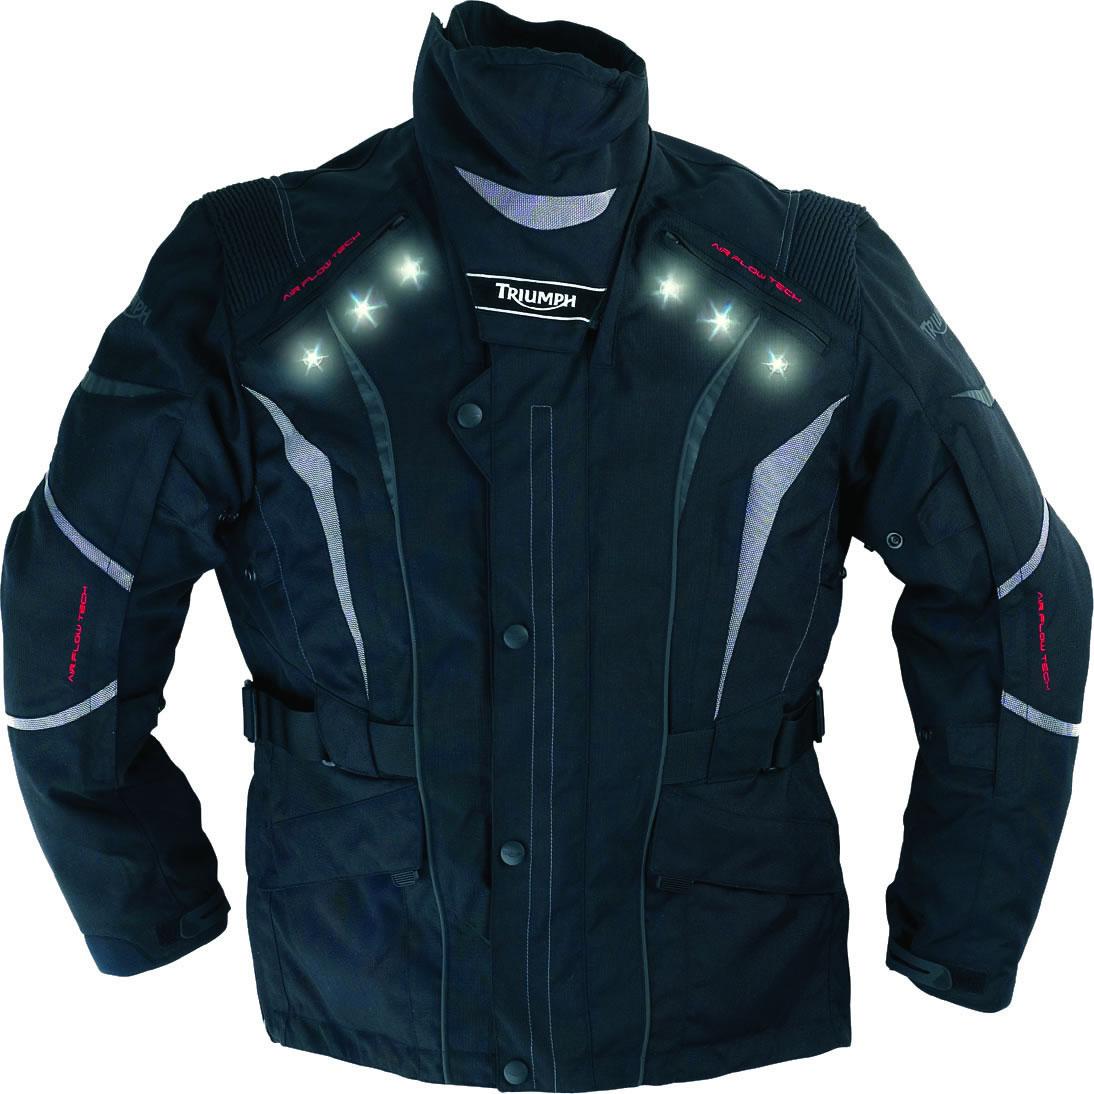 Triumph Sympatex Light Jacket